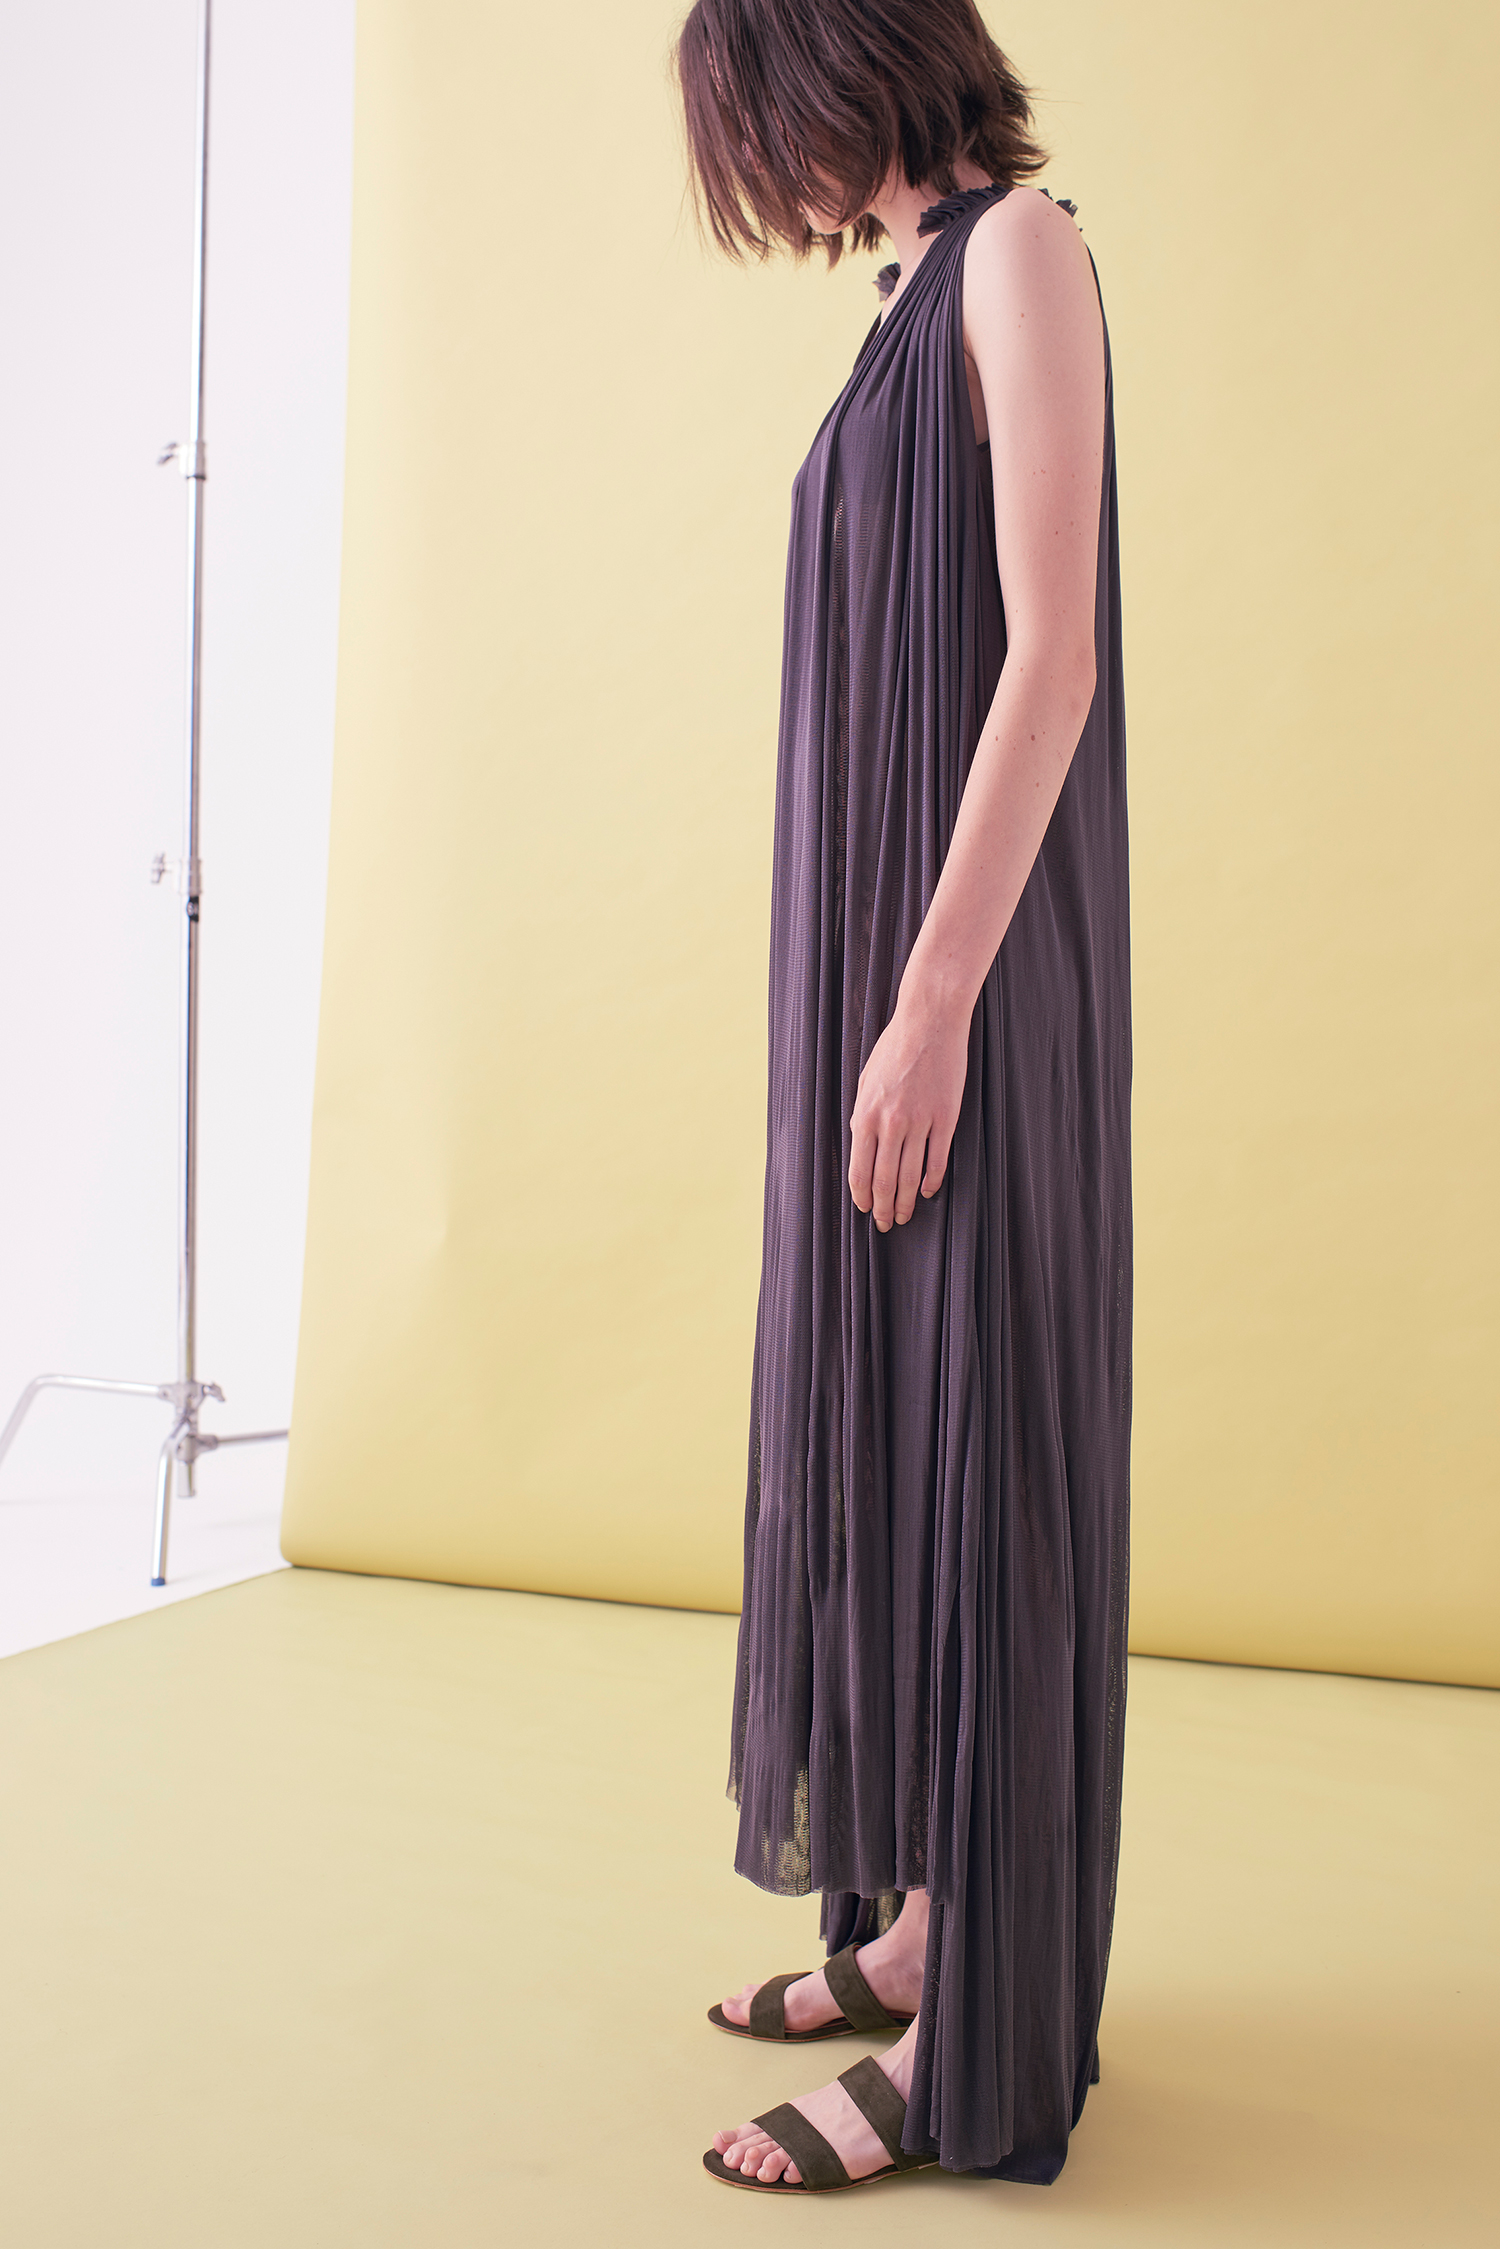 Sarah_Swann_SS17_04_Silk_Mesh_Step_Front_Dress_Slate_S.jpg